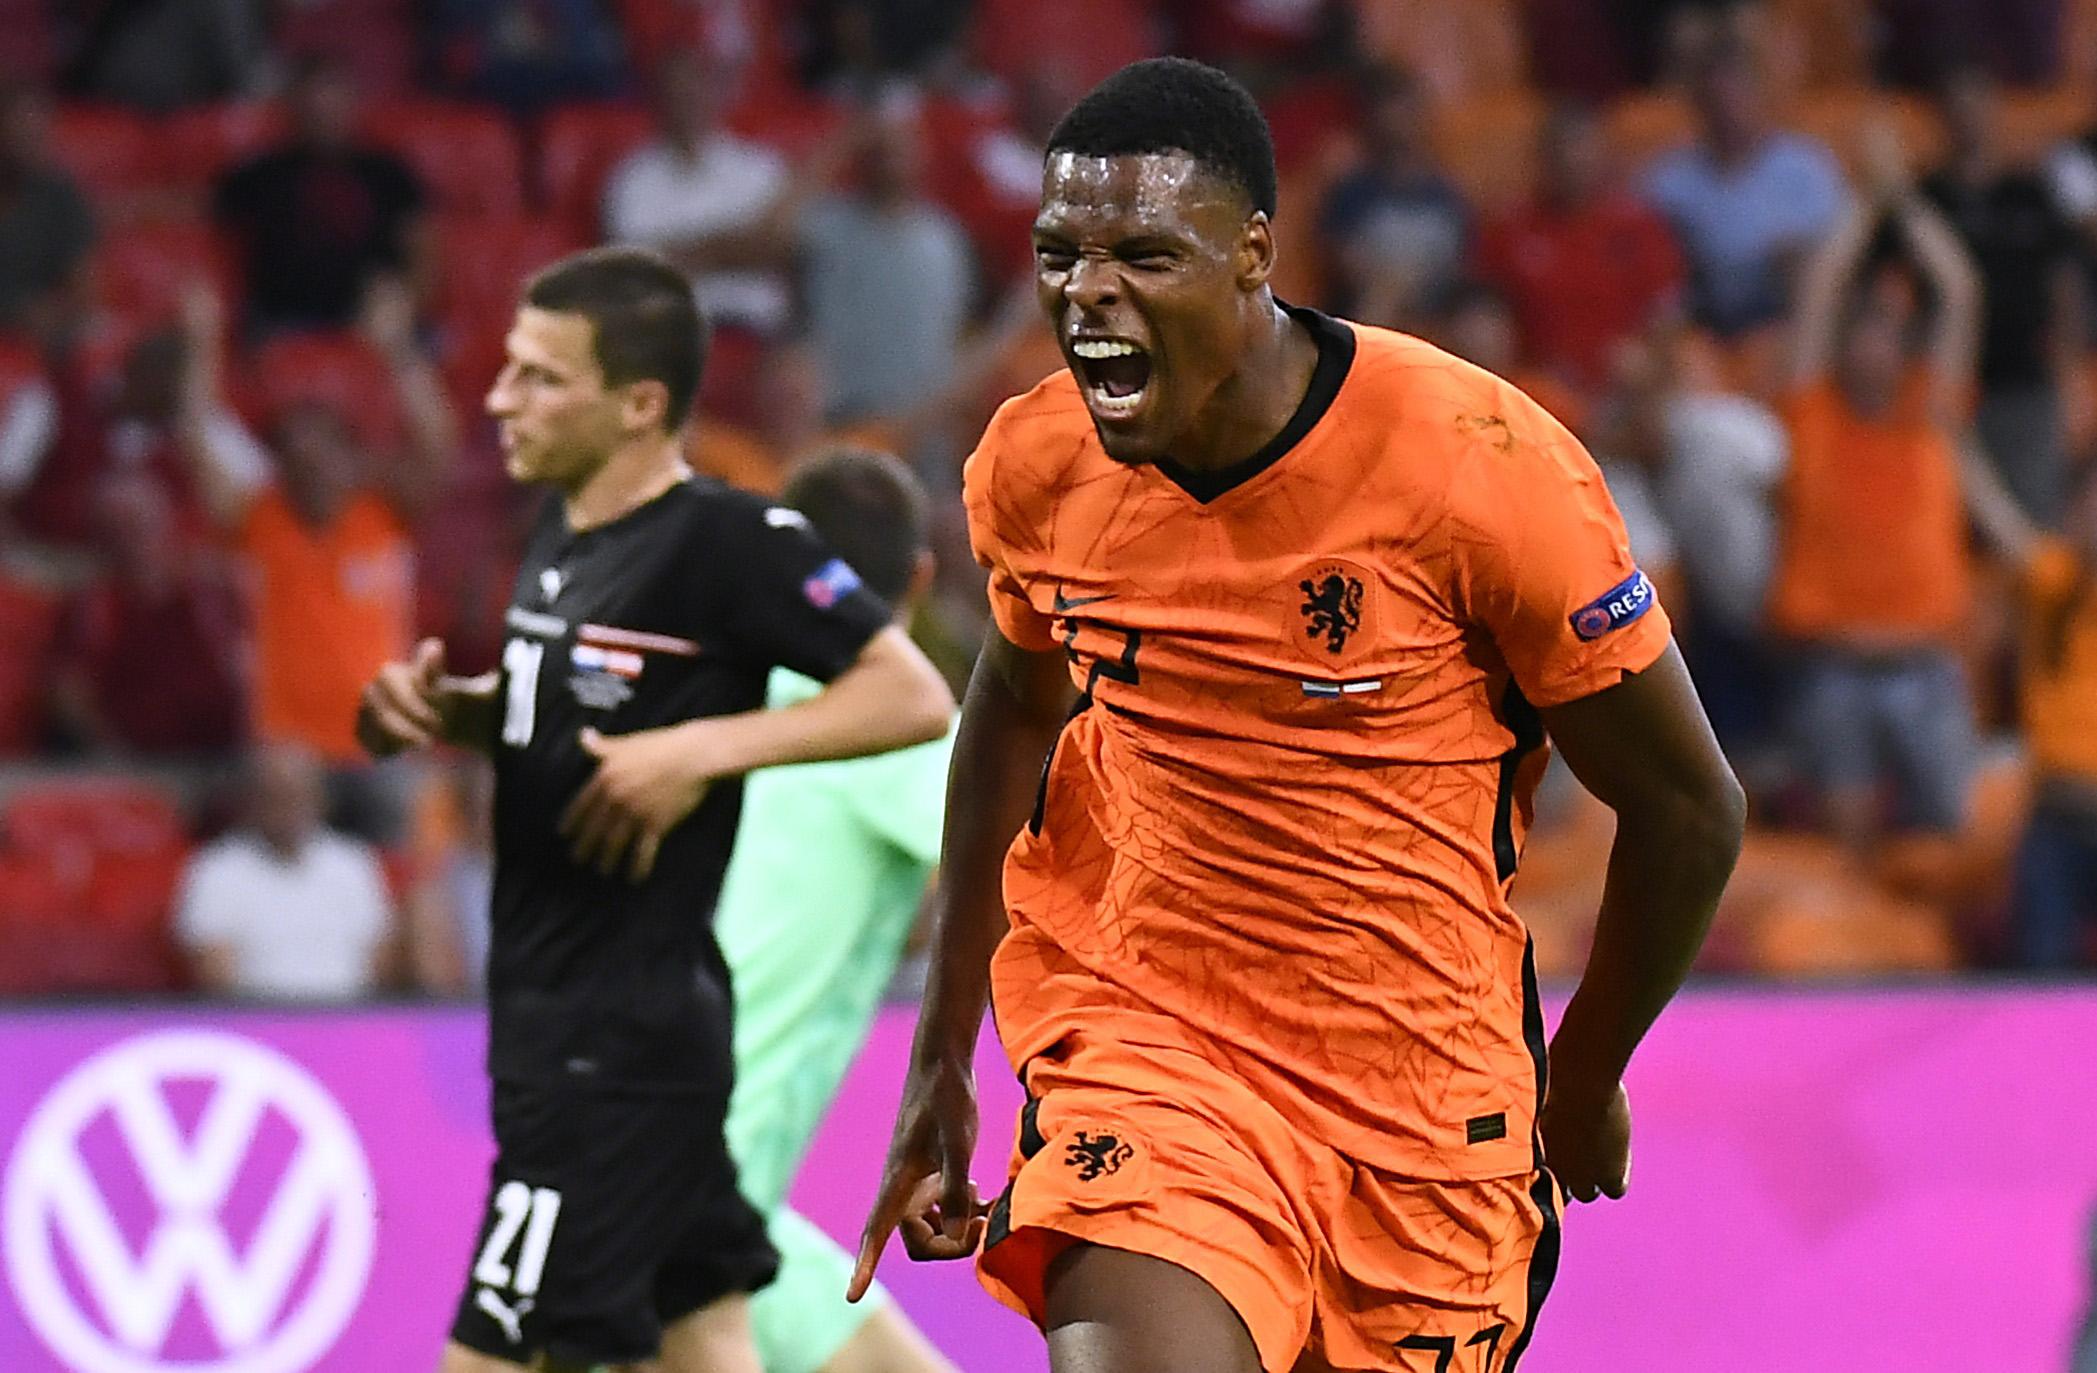 Euro 2020, Ολλανδία – Αυστρία 2-0: «Καθάρισαν» εύκολα οι «Οράνιε» και προκρίθηκαν στους «16»